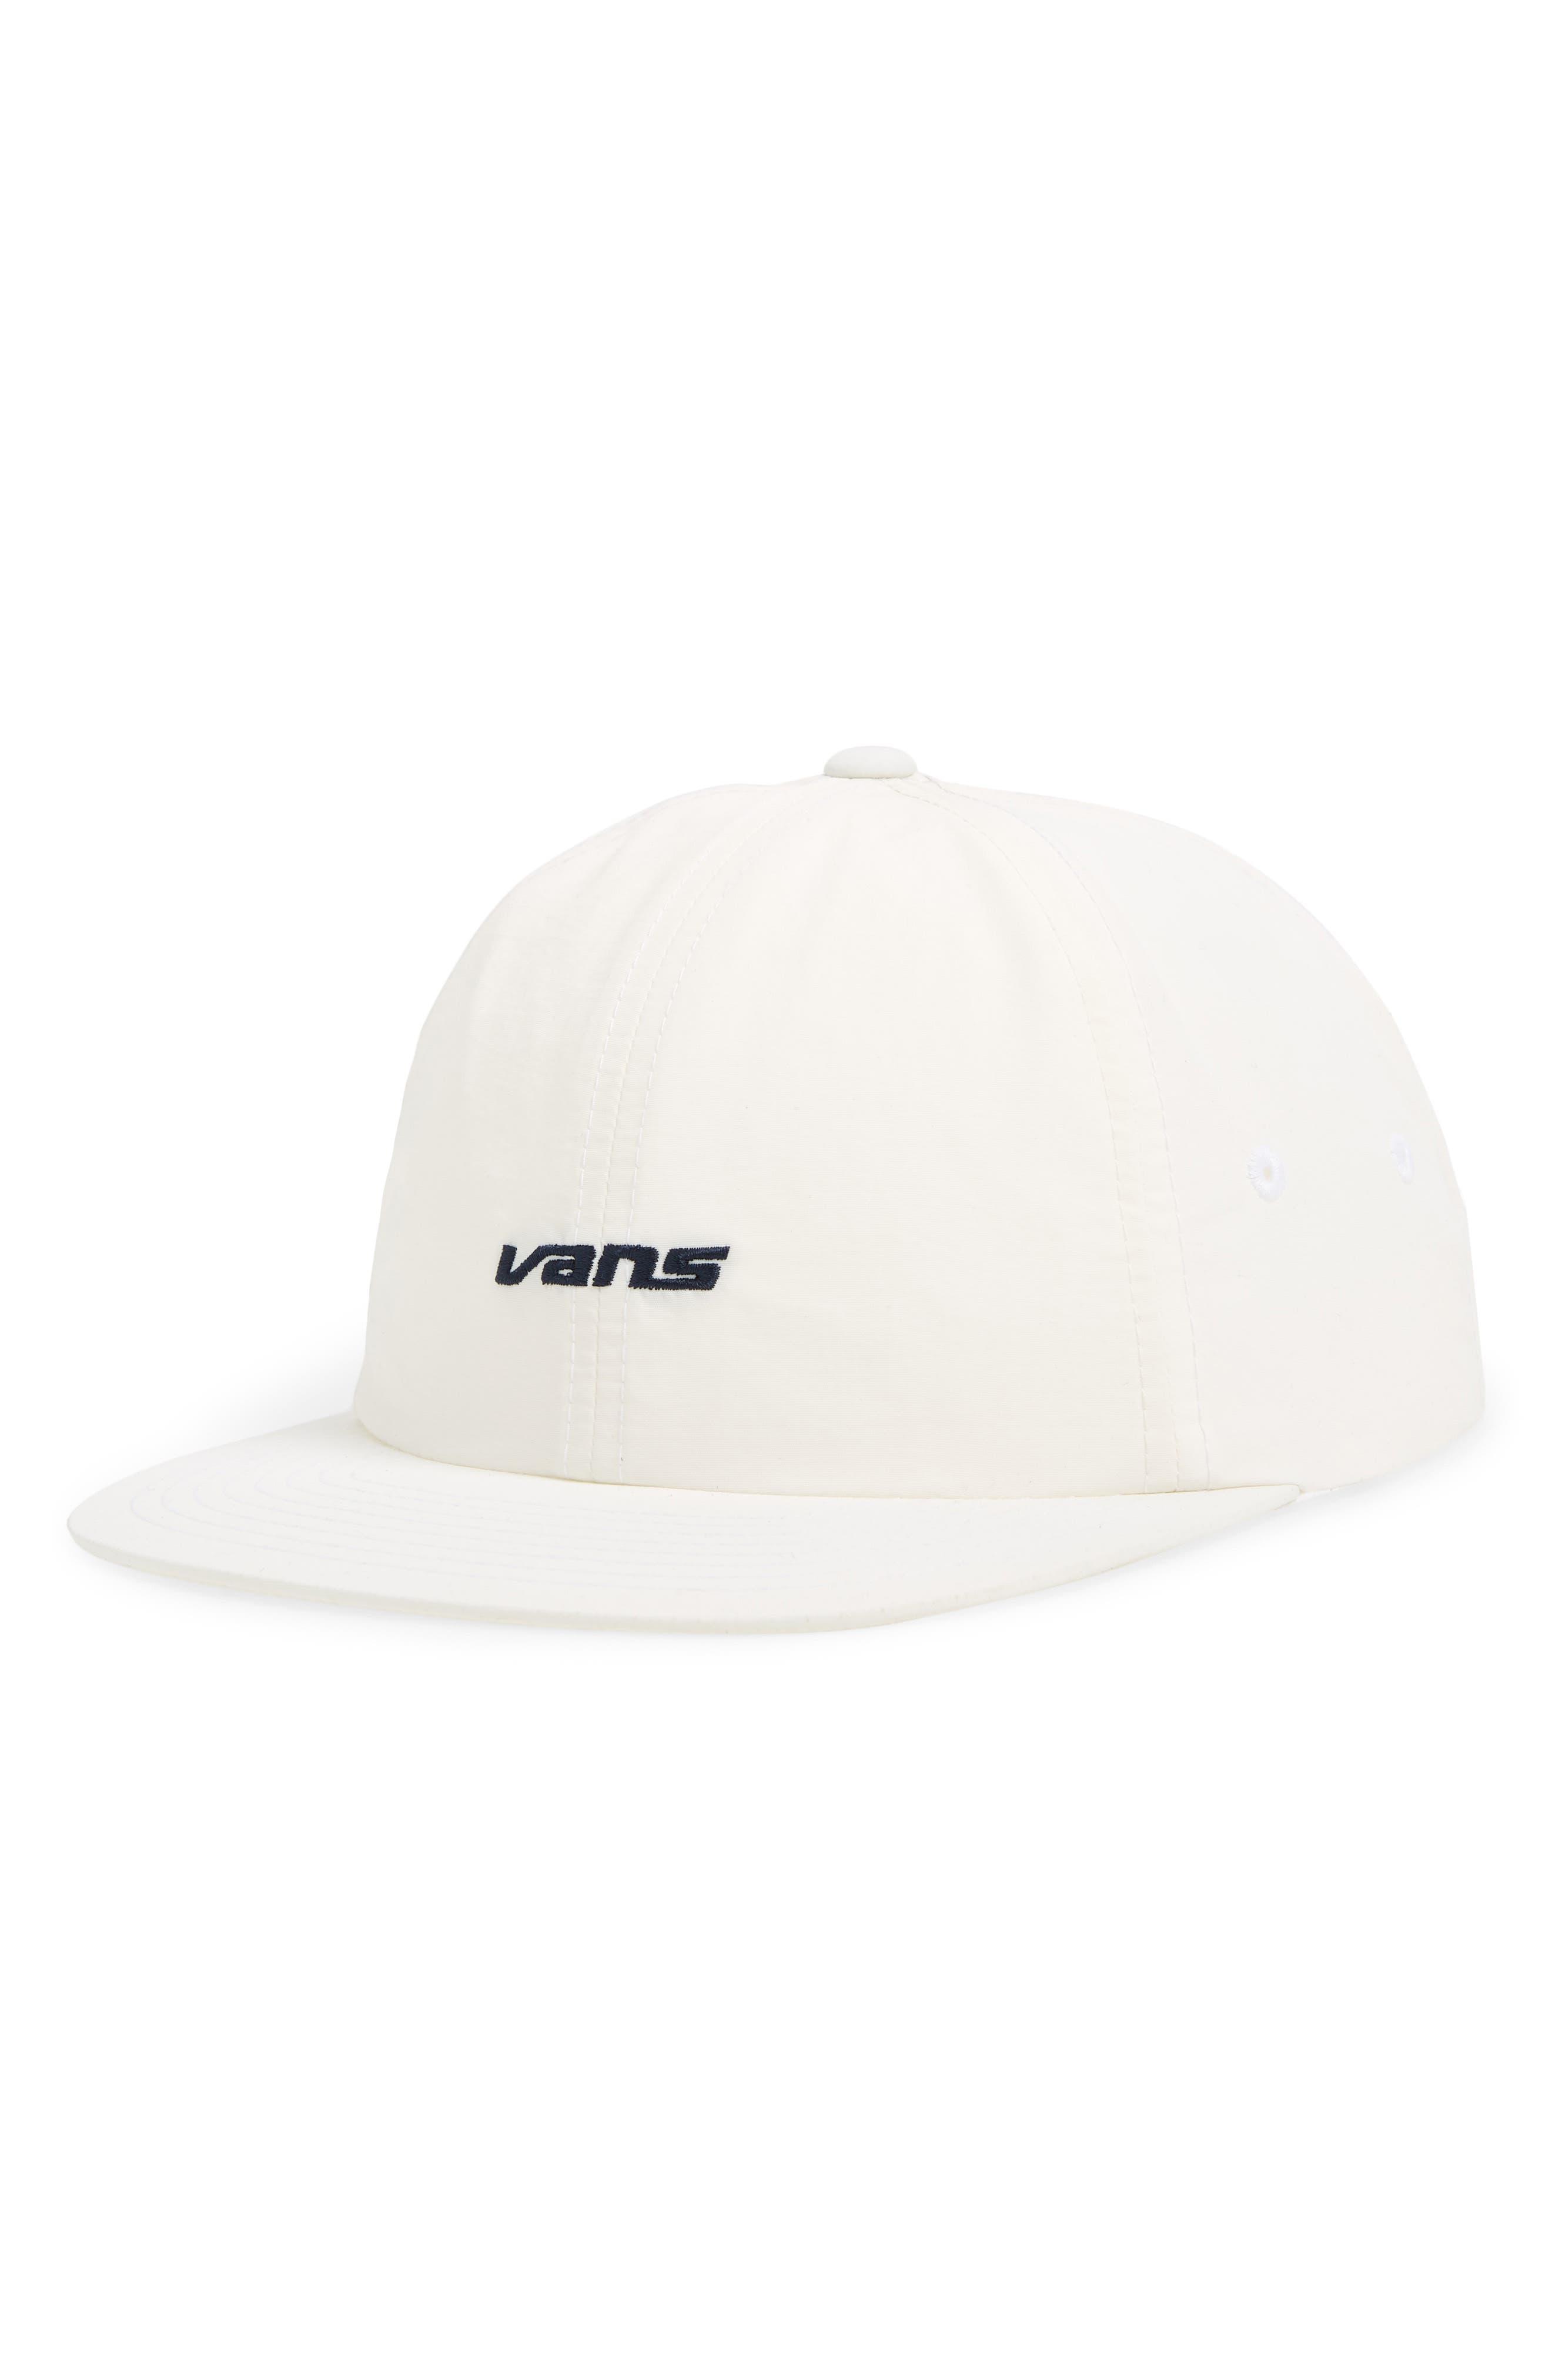 Norvell Jockety Embroidered Baseball Cap,                         Main,                         color, White